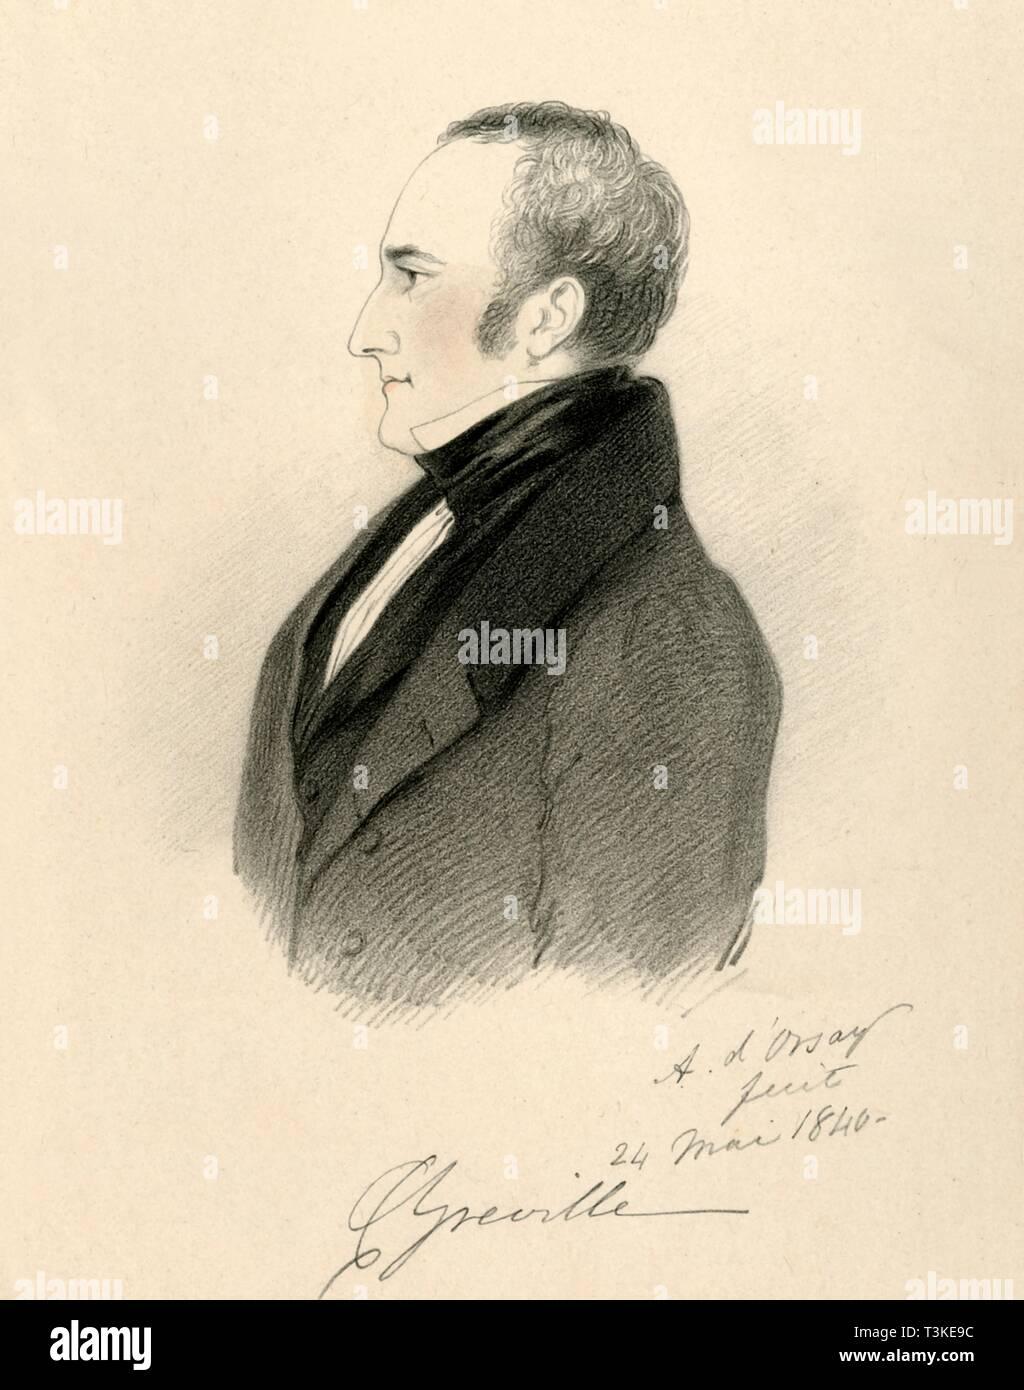 'Charles Greville', 1840. Creator: Richard James Lane. - Stock Image